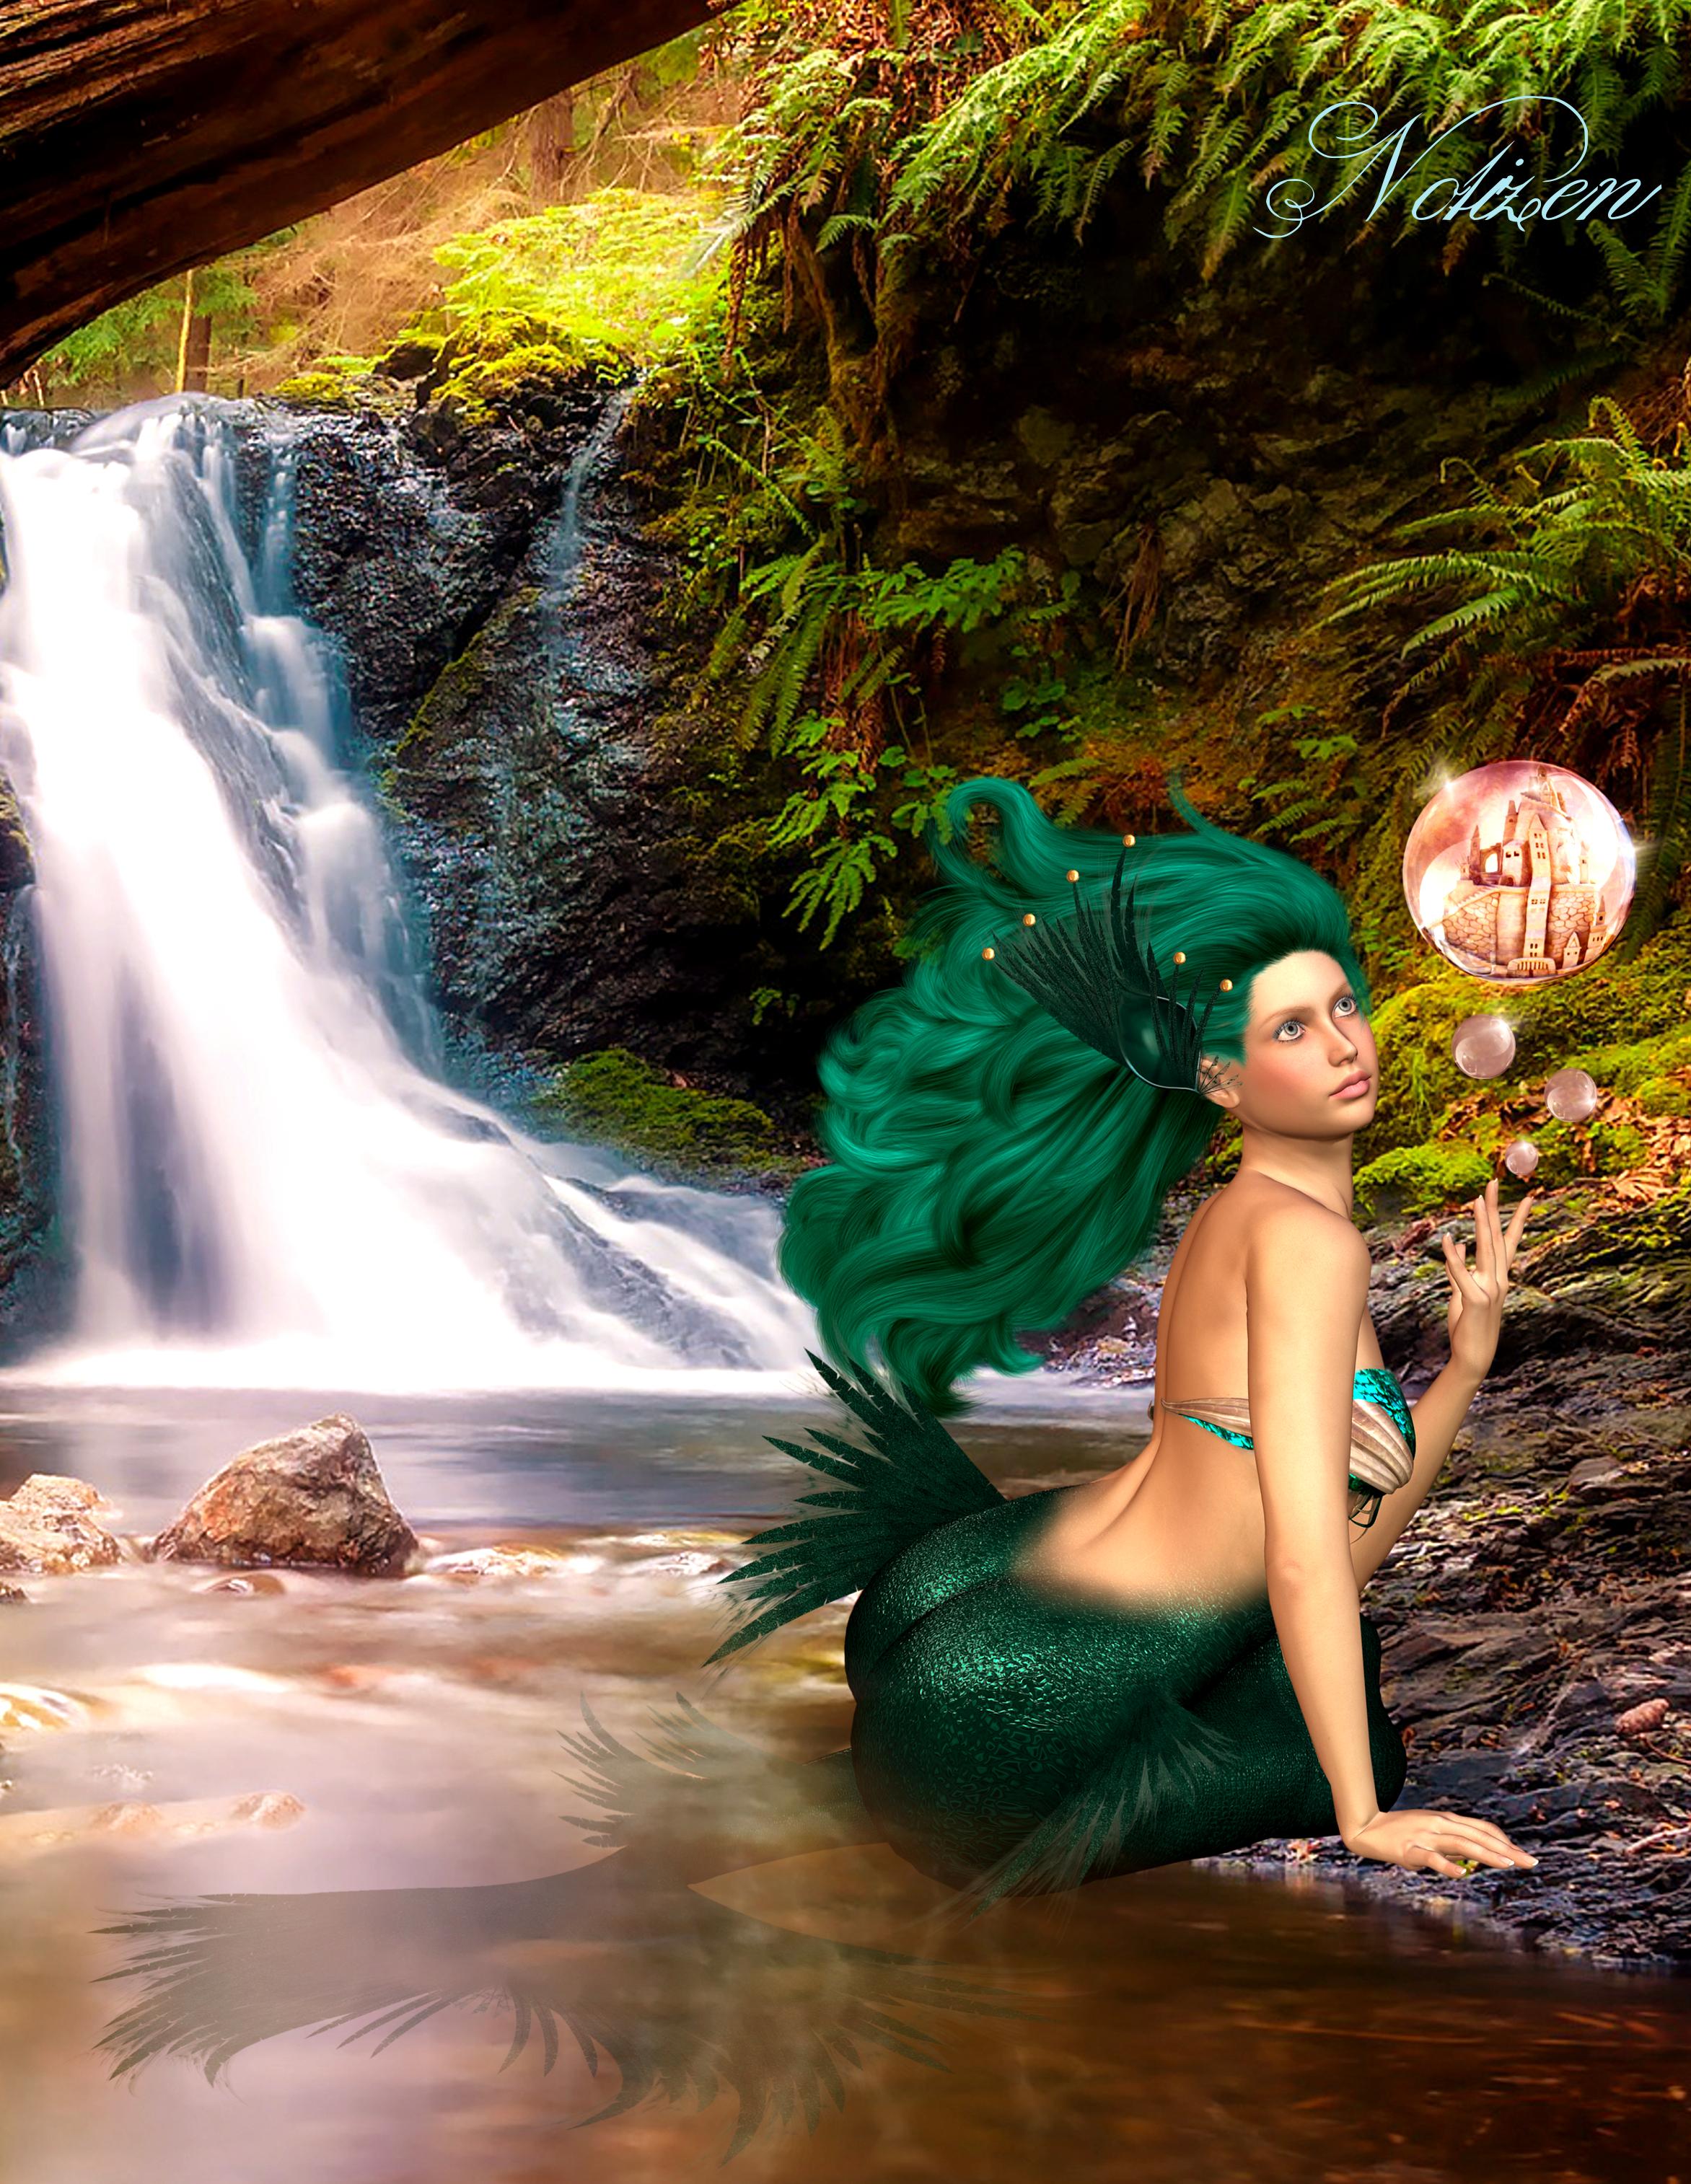 Fantasy Notizbuch 13: Tjirell, die M